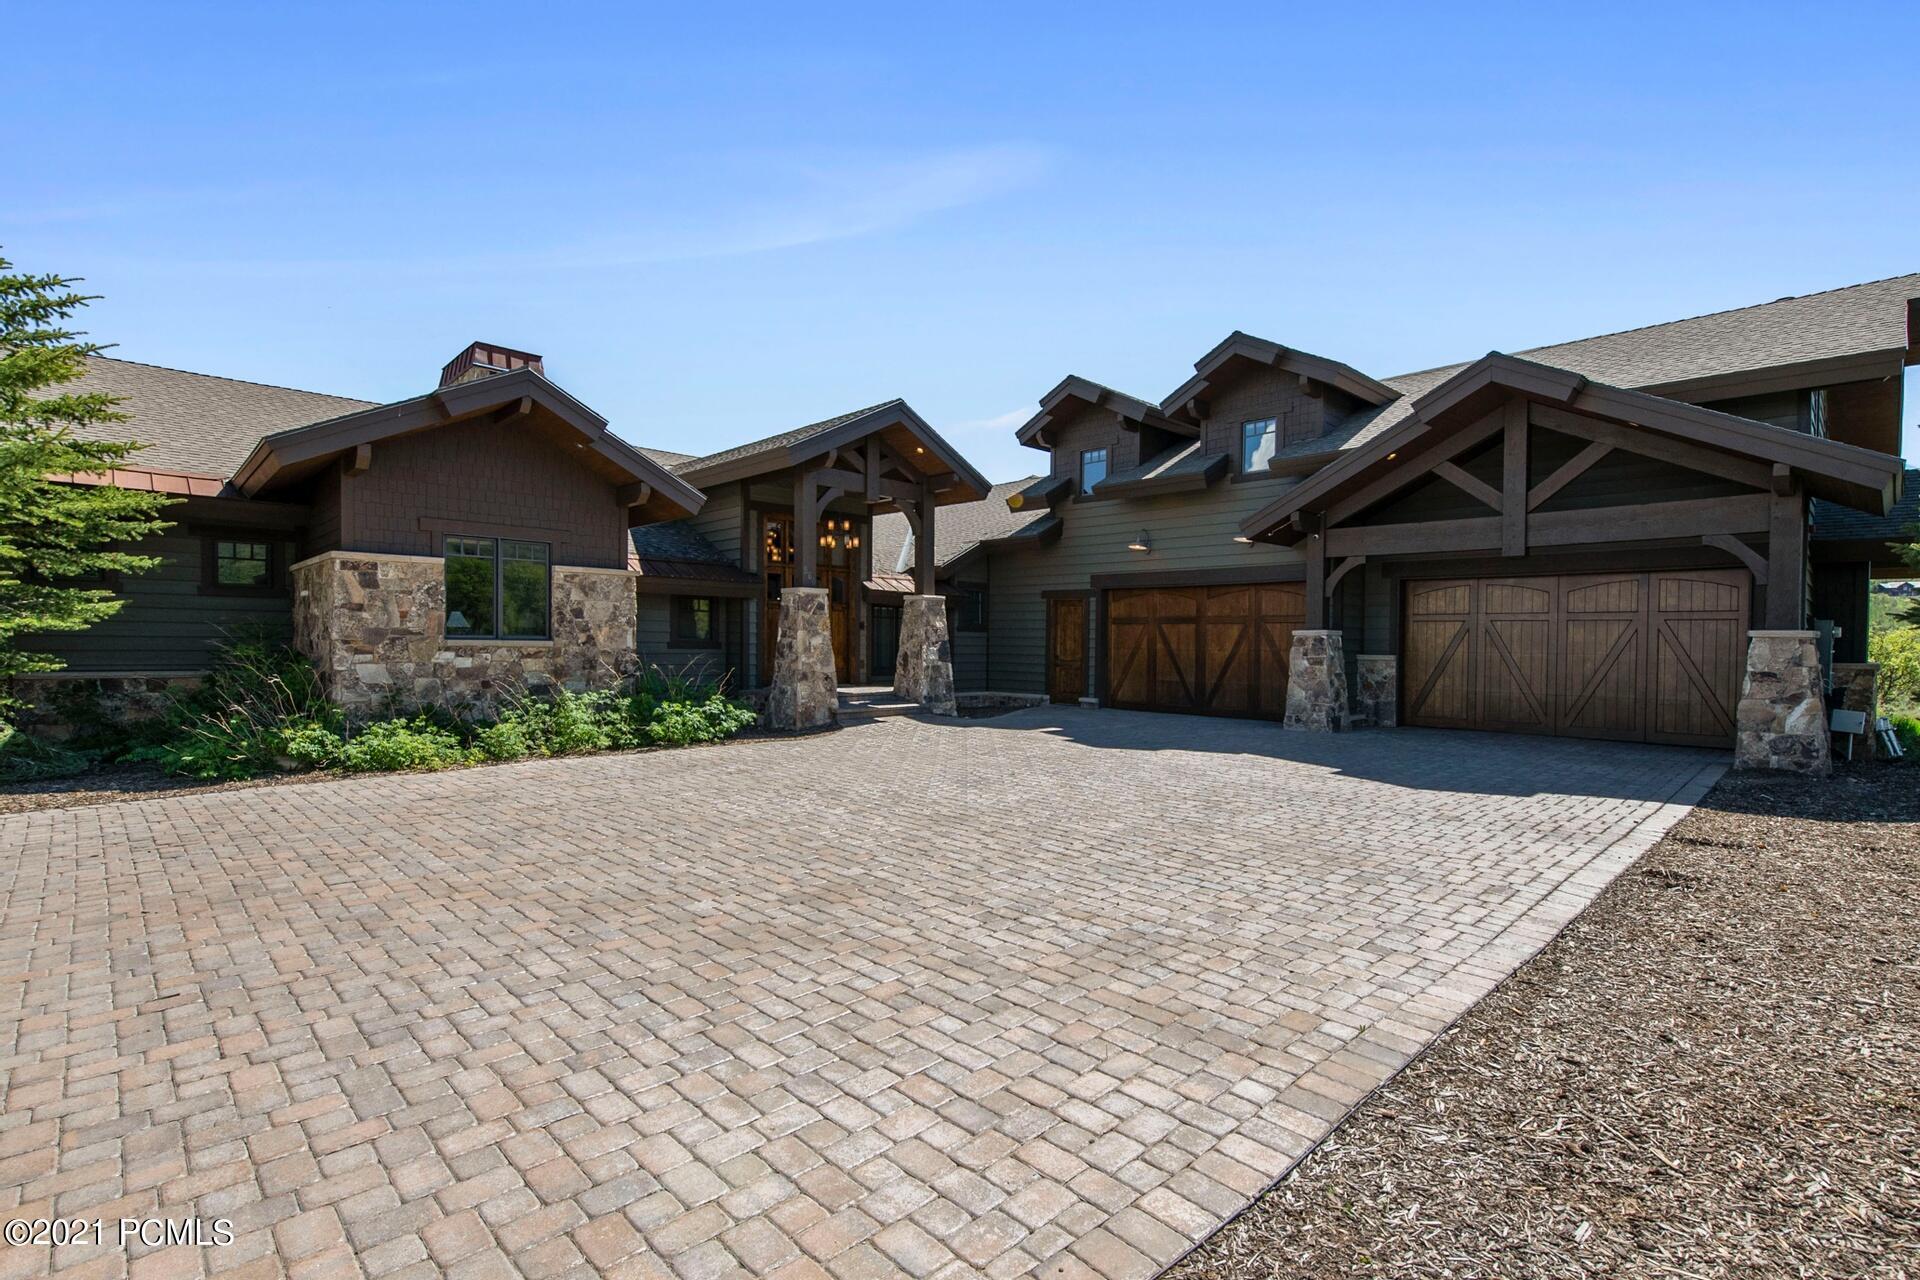 960 Deer Hill Road, Park City, Utah 84098, 6 Bedrooms Bedrooms, ,8 BathroomsBathrooms,Single Family,For Sale,Deer Hill,12102425